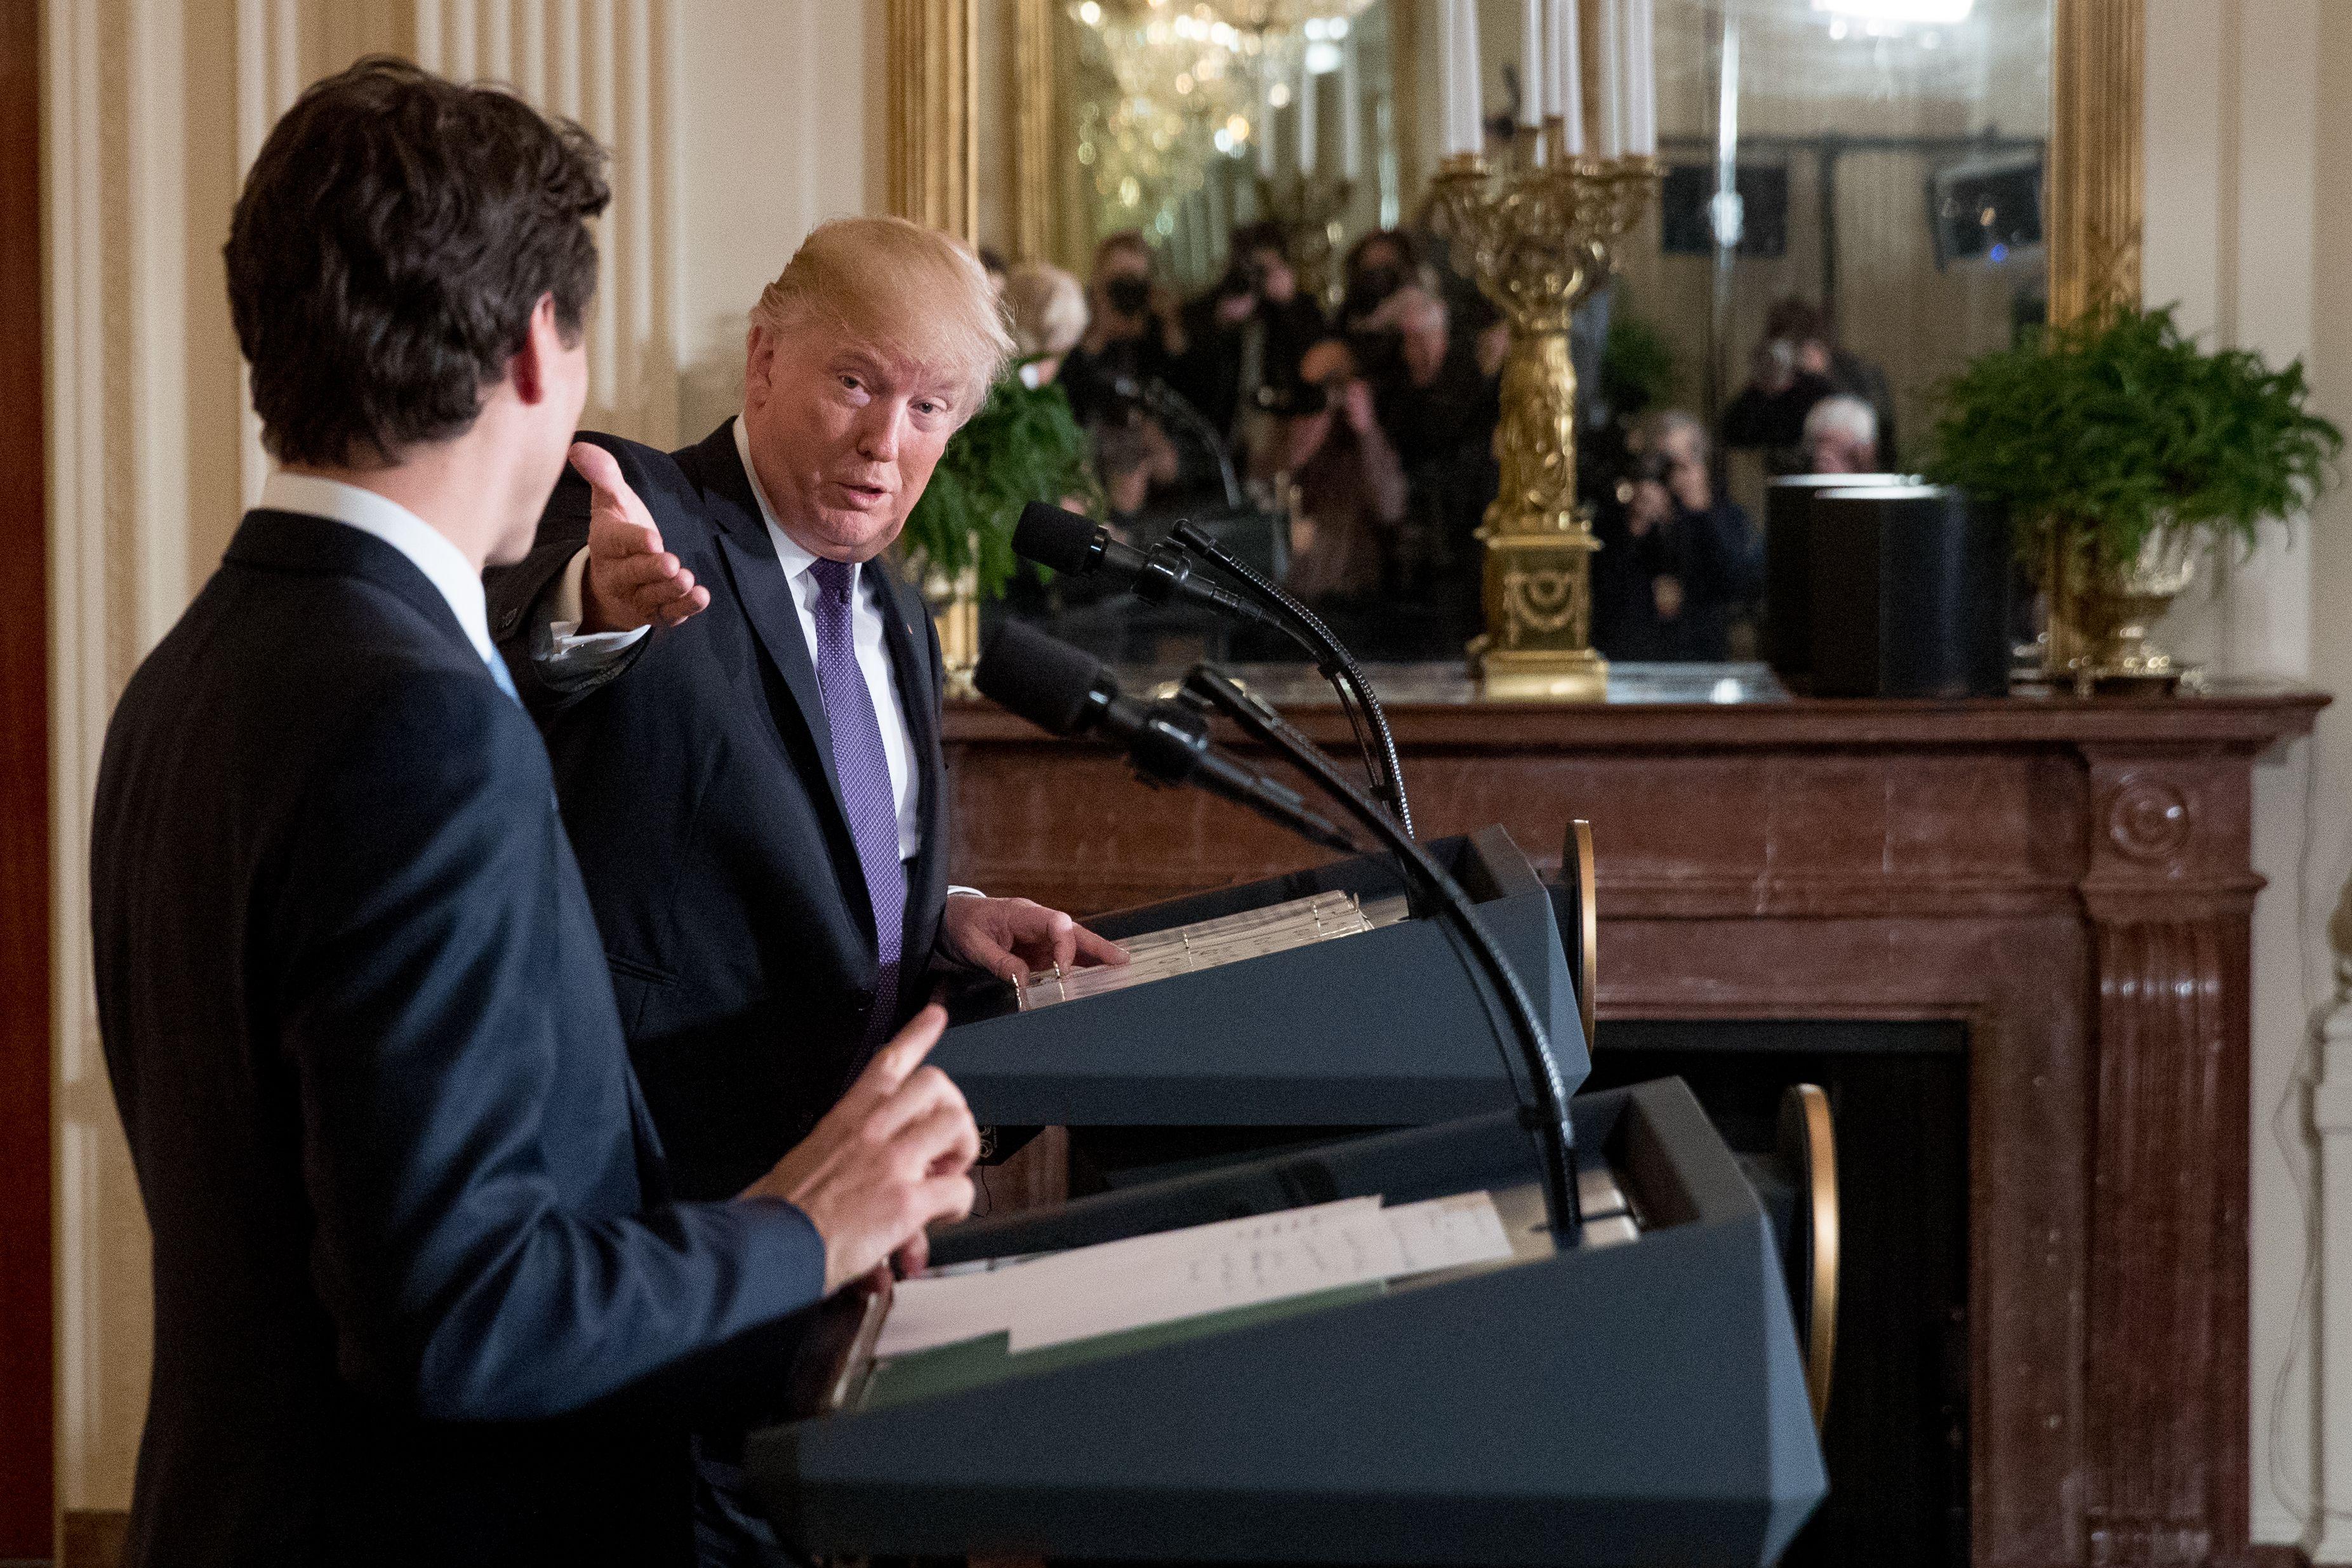 Trump US Canada, Washington, USA - 13 Feb 2017